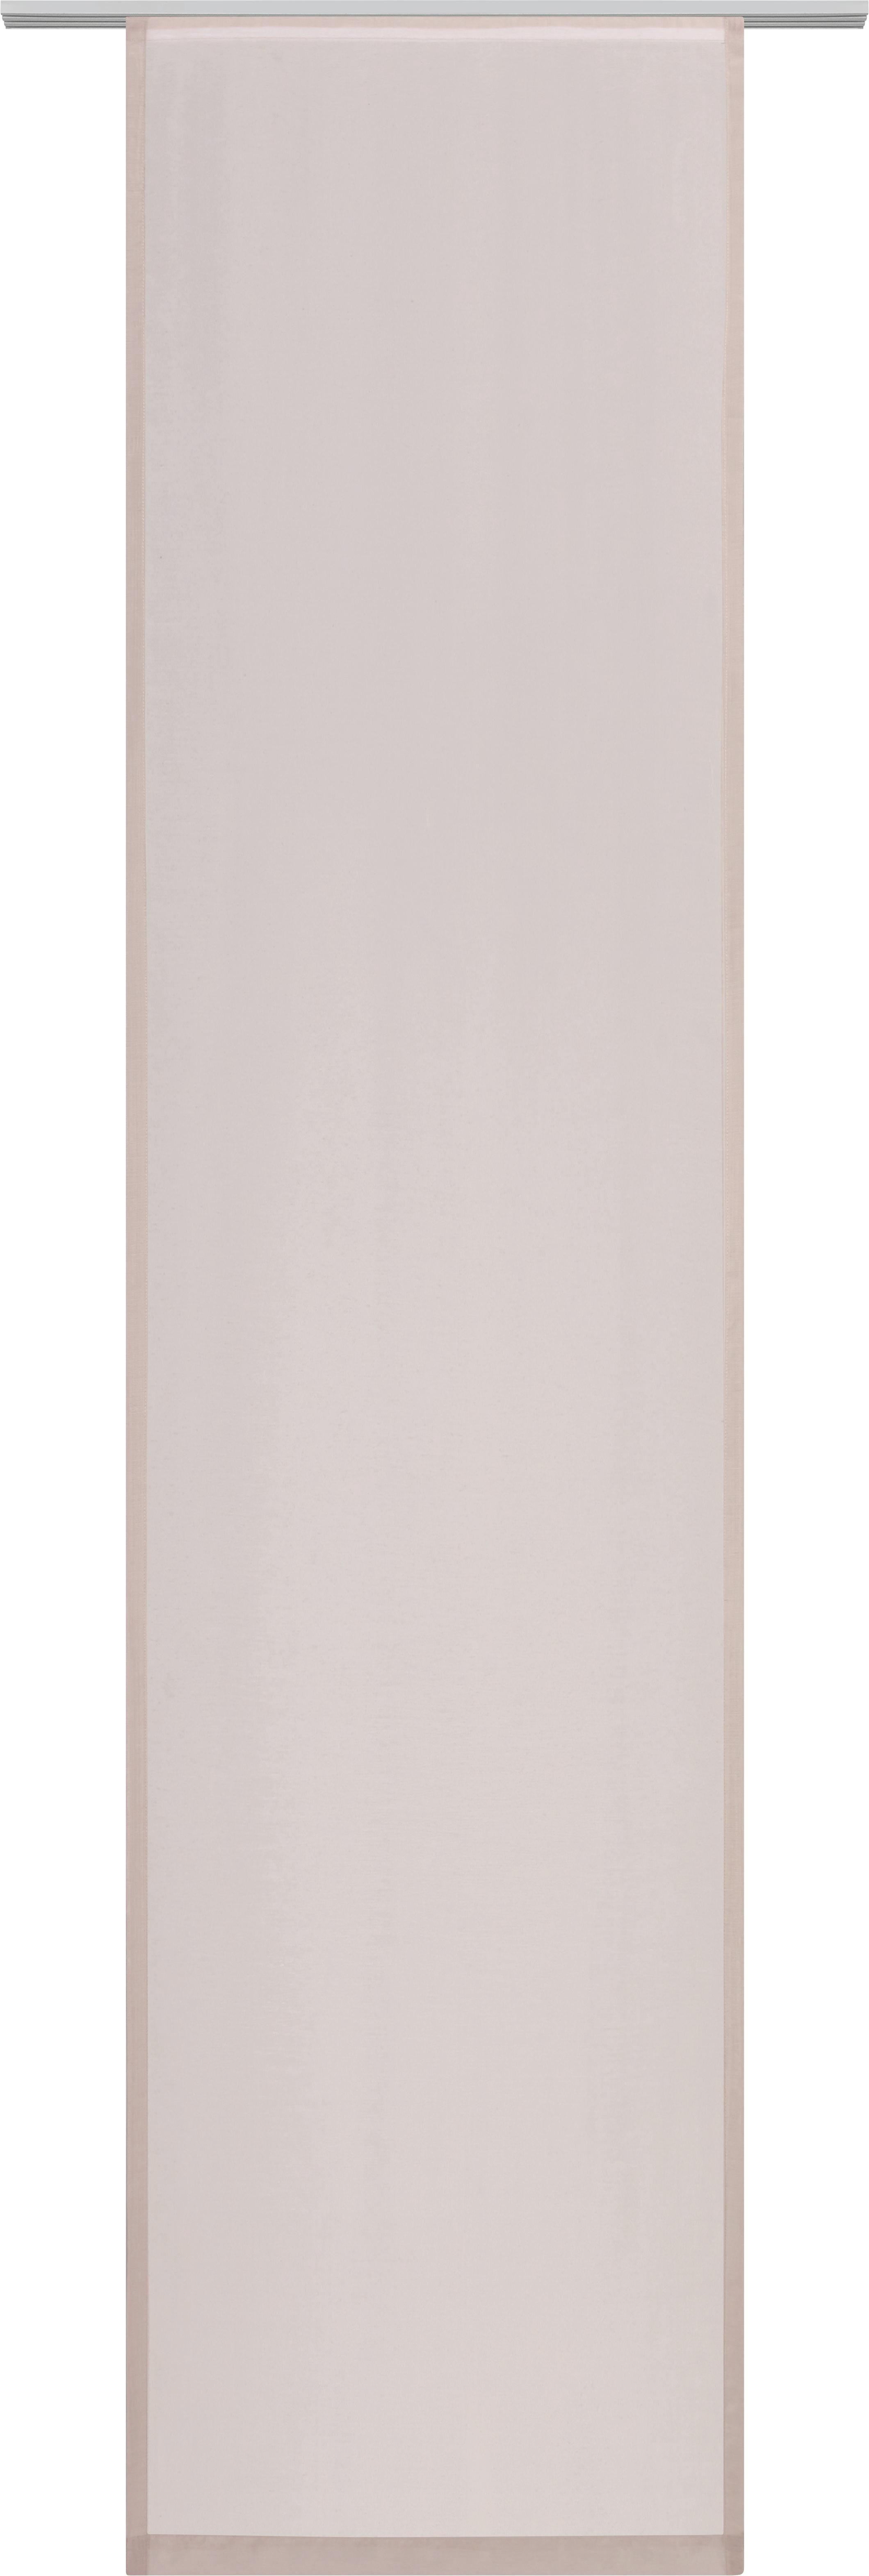 Lapfüggöny Uni - szürkésbarna, modern, textil (60/245cm) - MÖMAX modern living